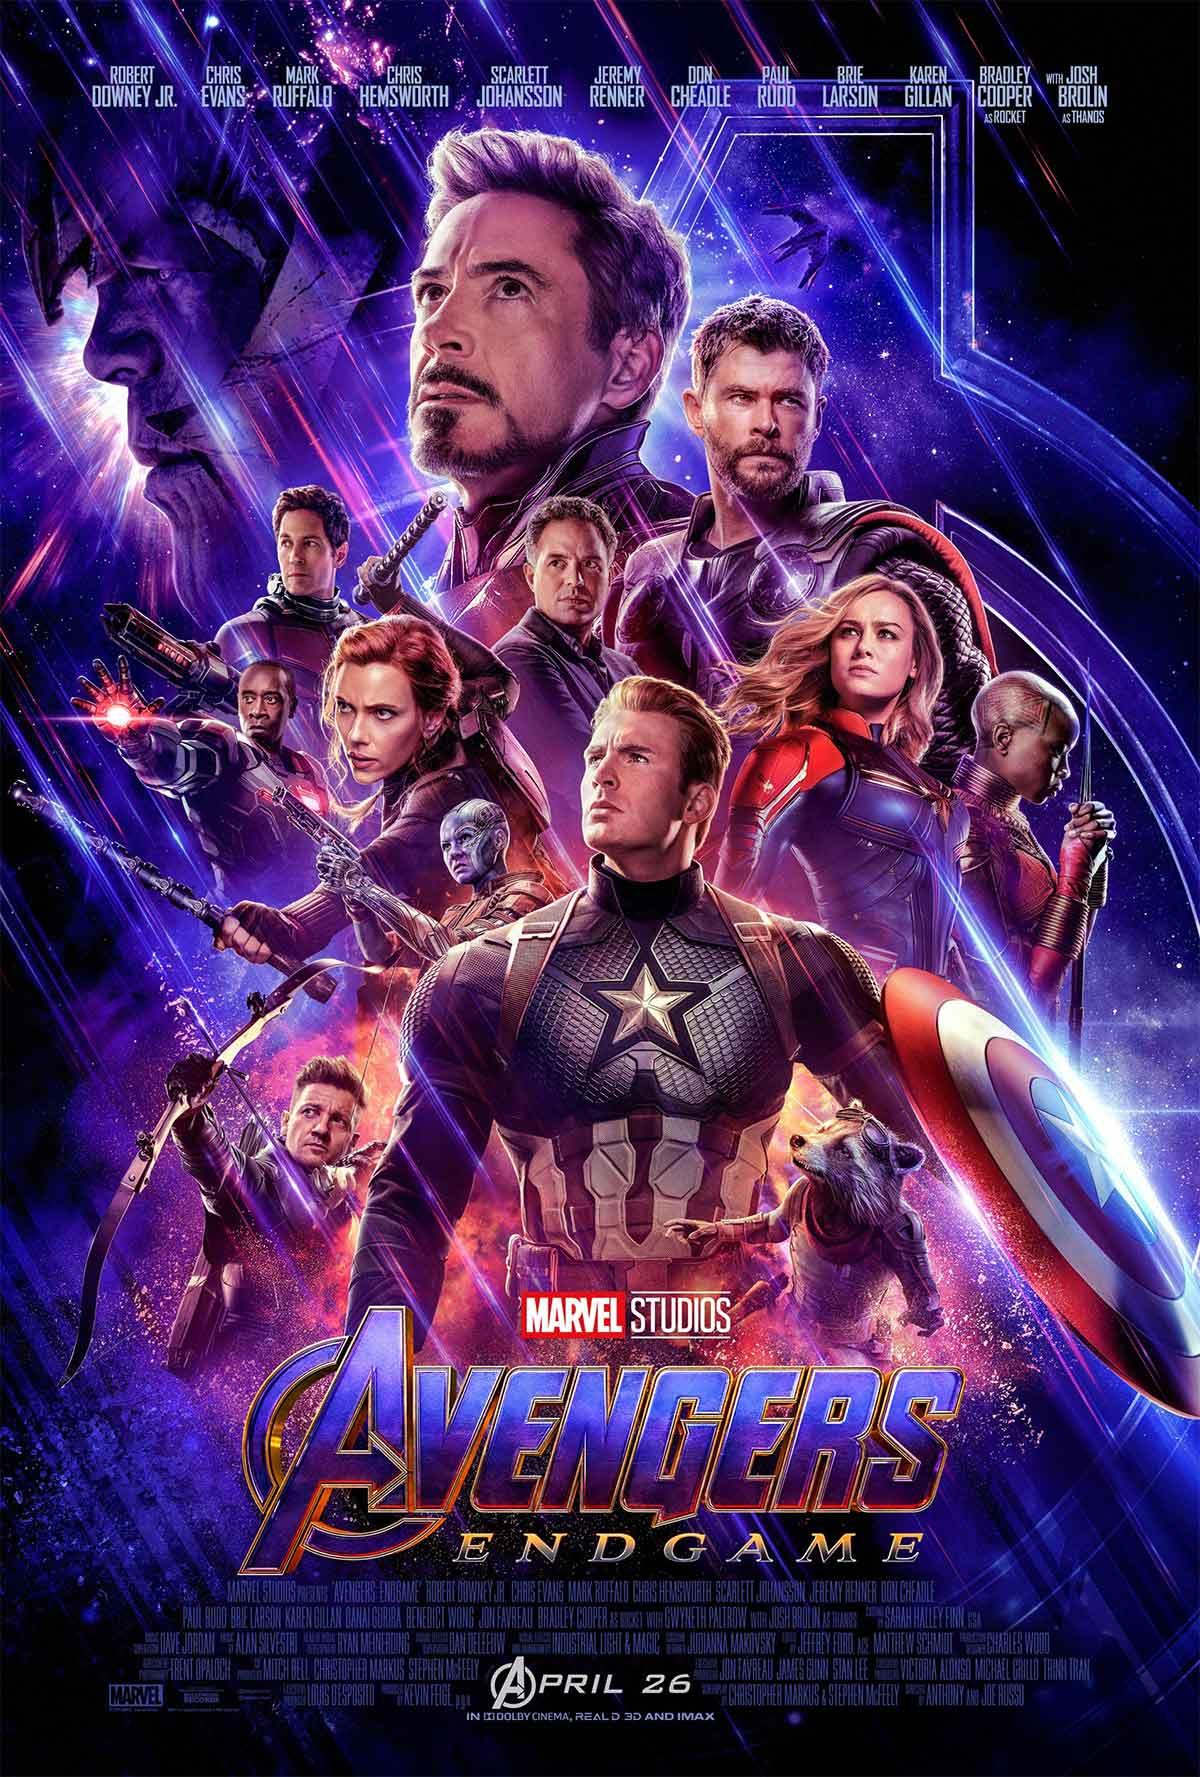 Sinopsis oficial de Vengadores: Endgame de Marvel Studios